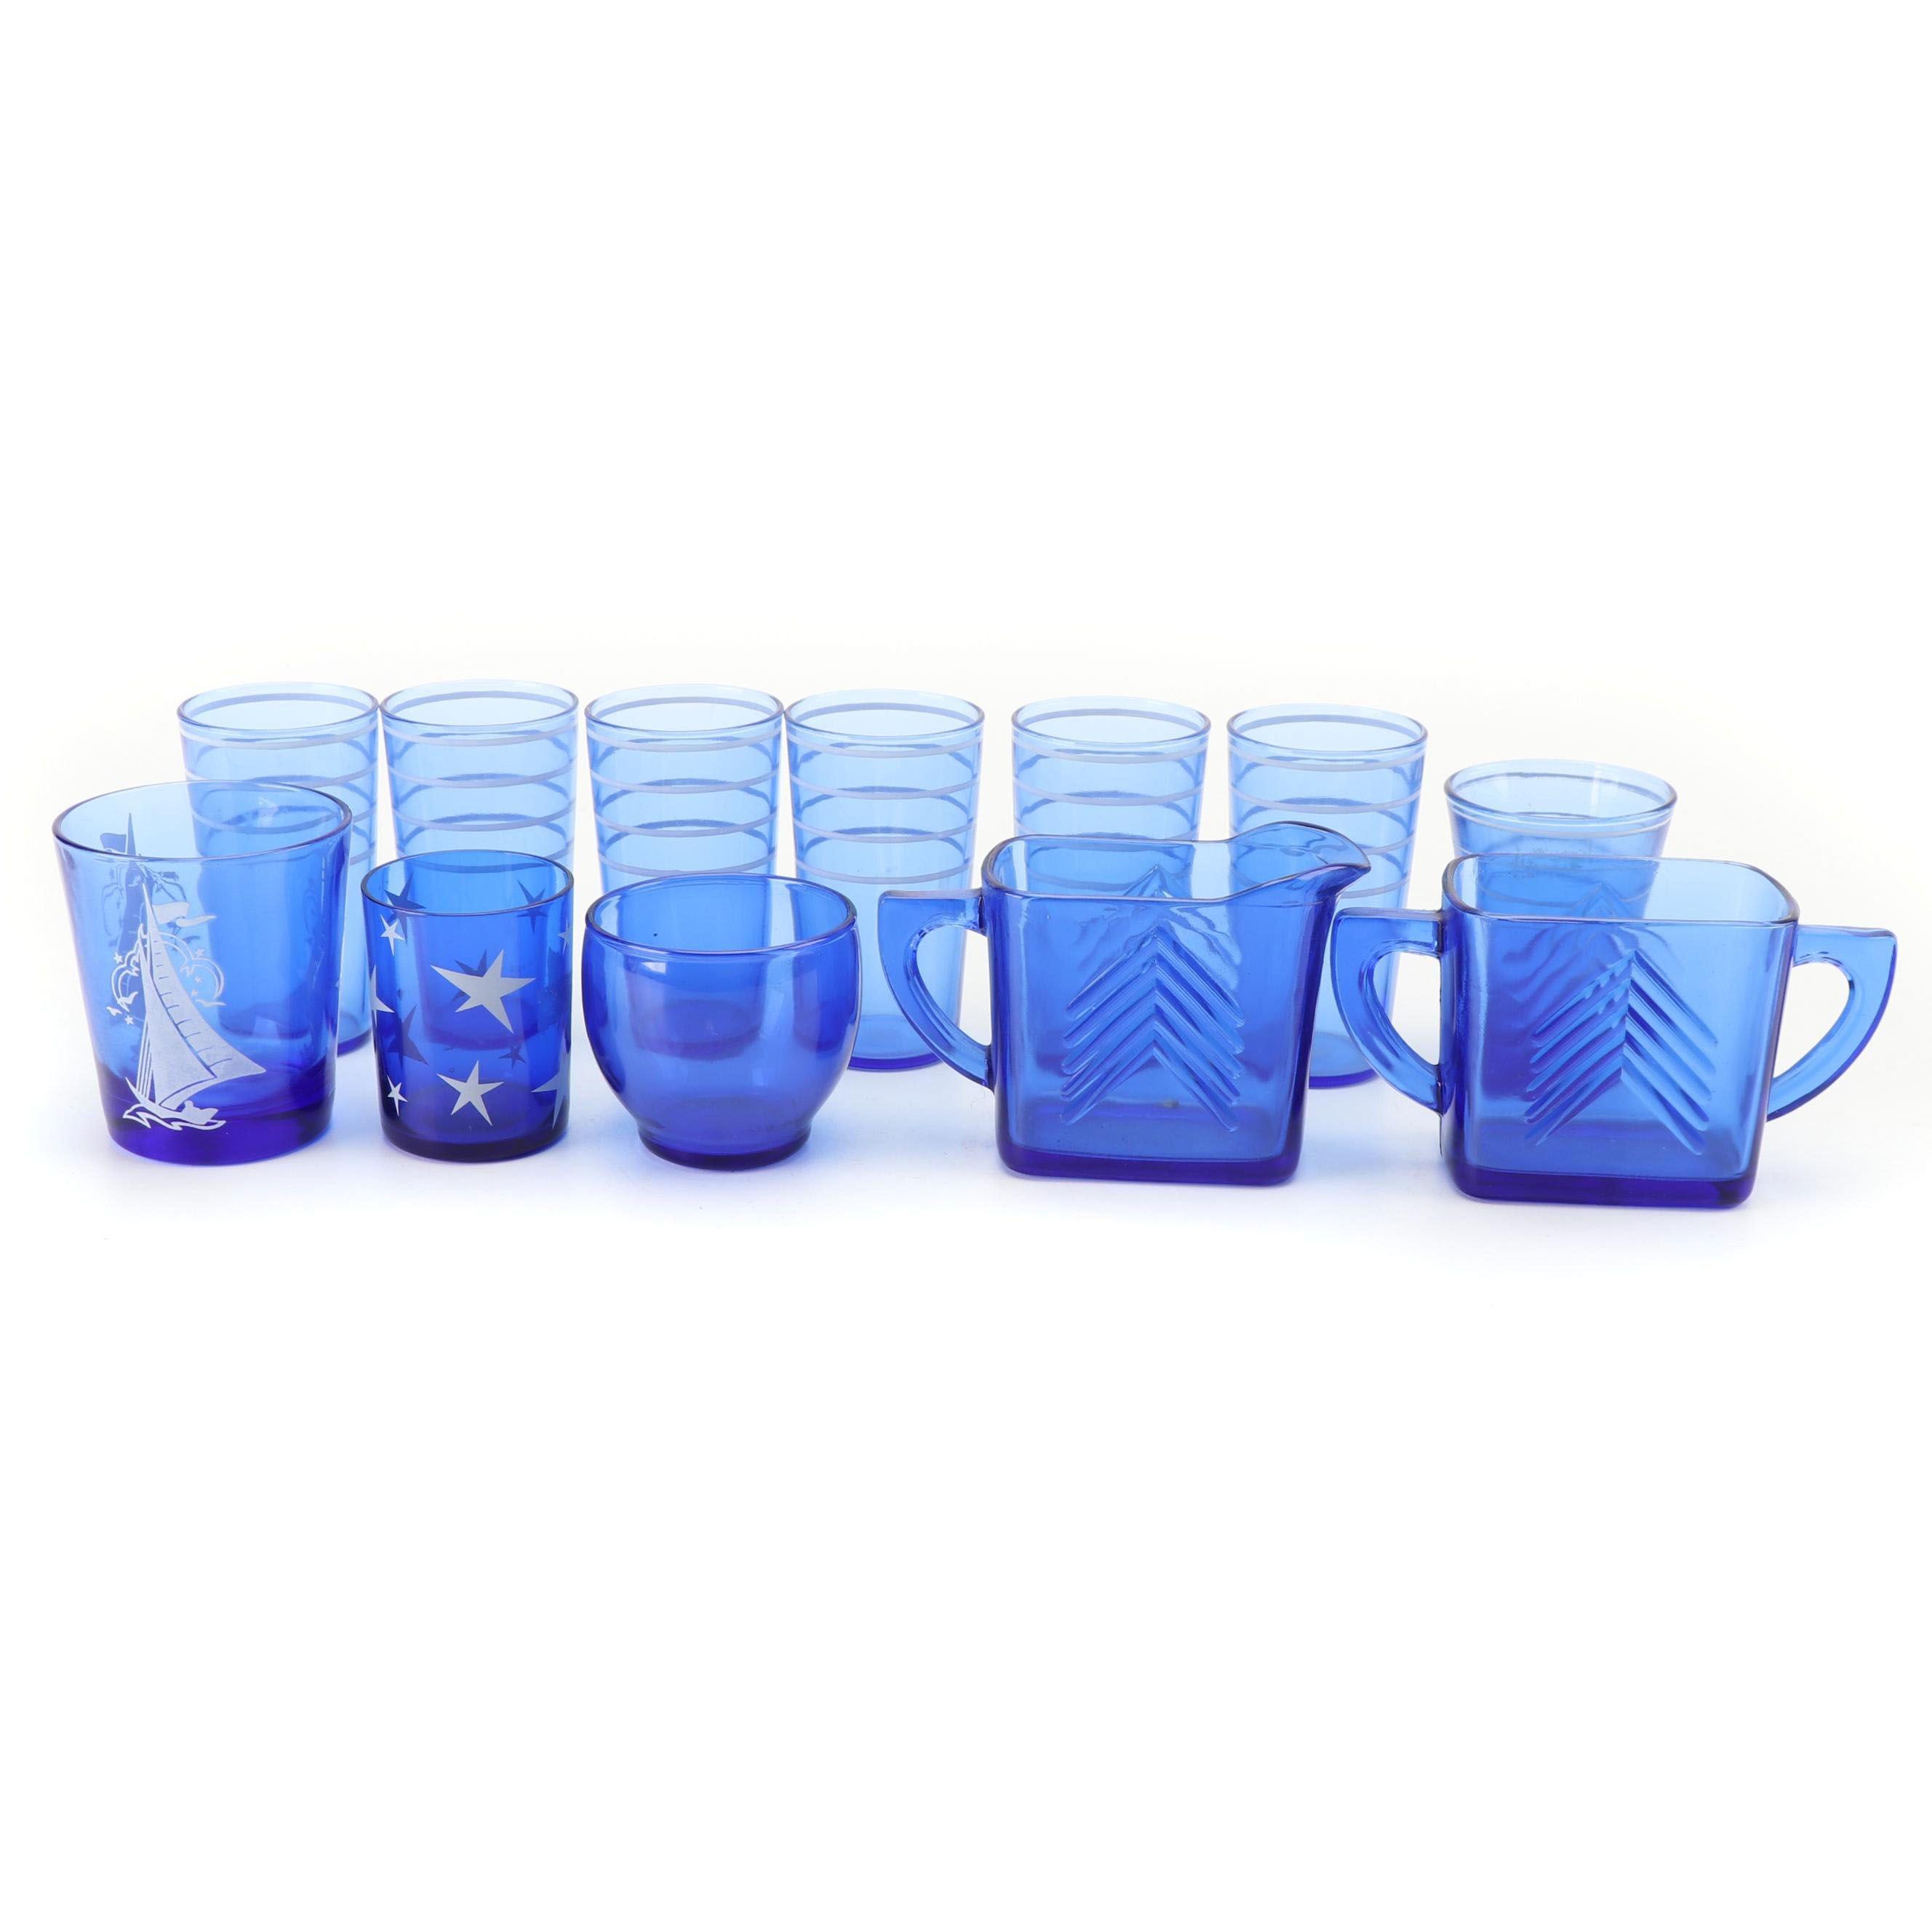 Hazel-Atlas Blue Glassware, Mid-Century